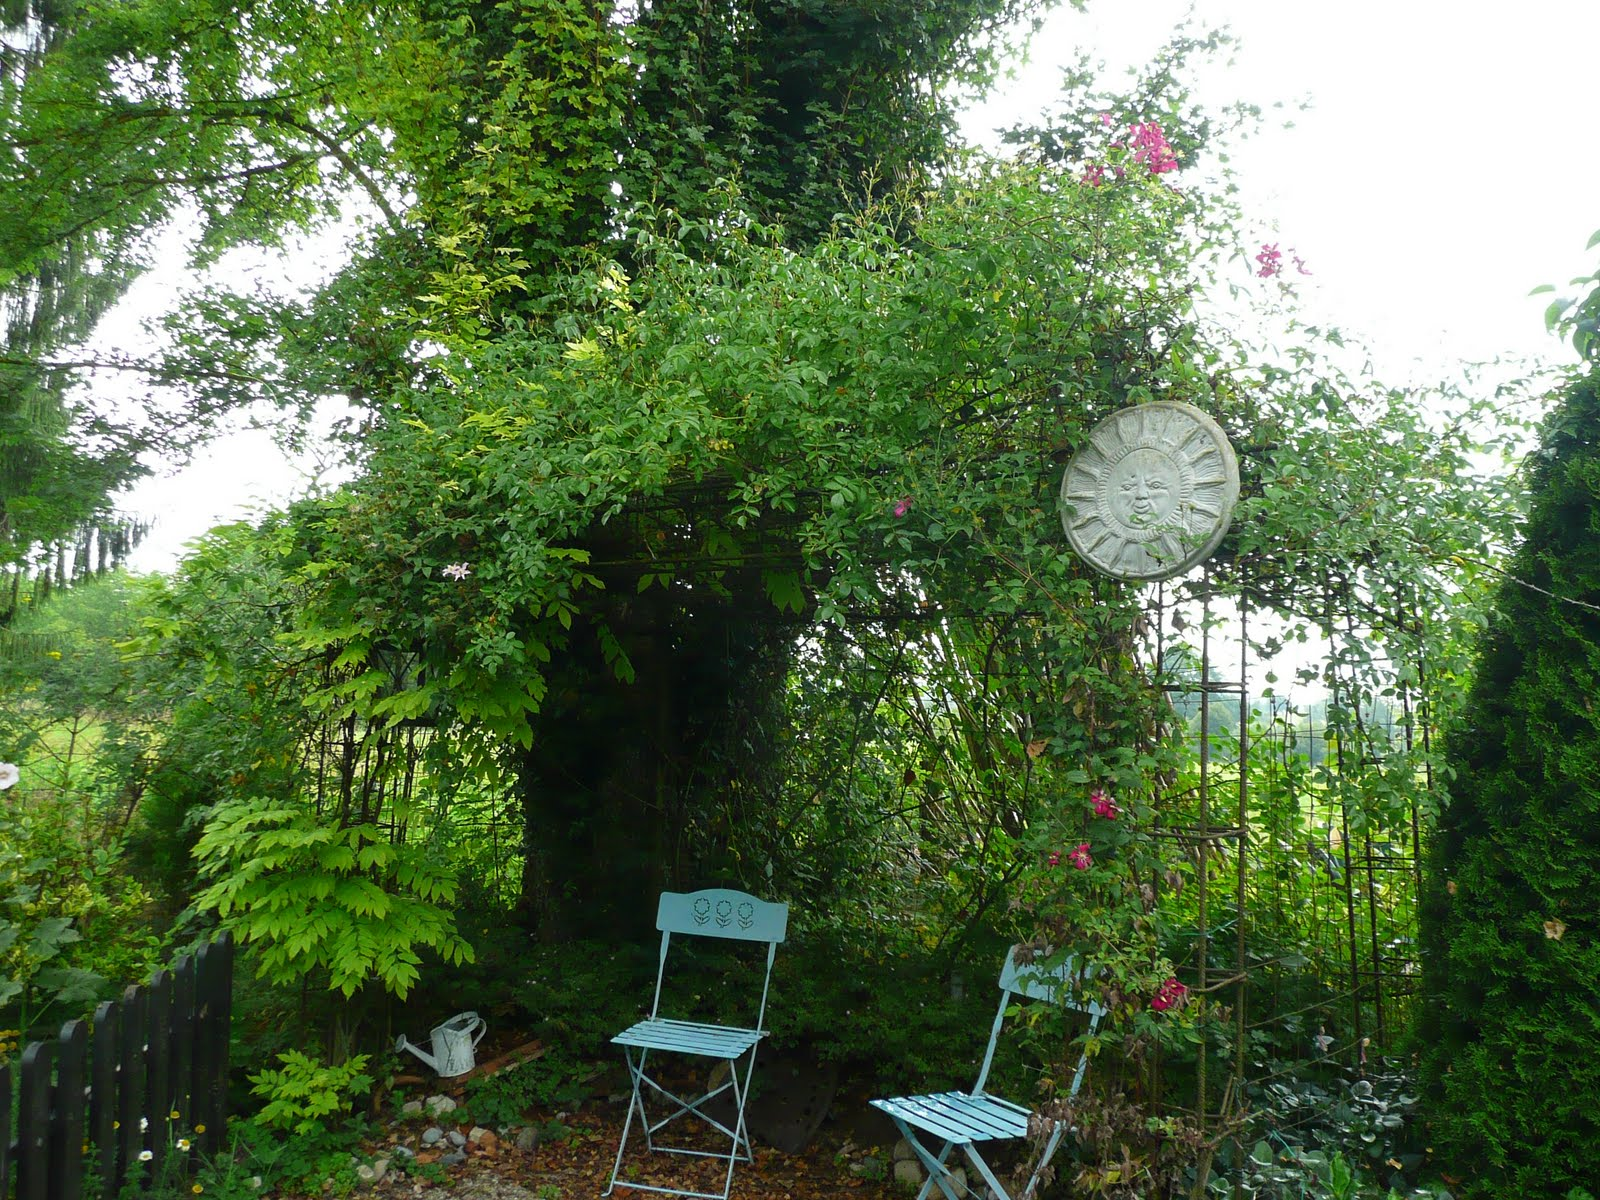 Notre jardin secret jardin de meli melo for Jardin secret 78